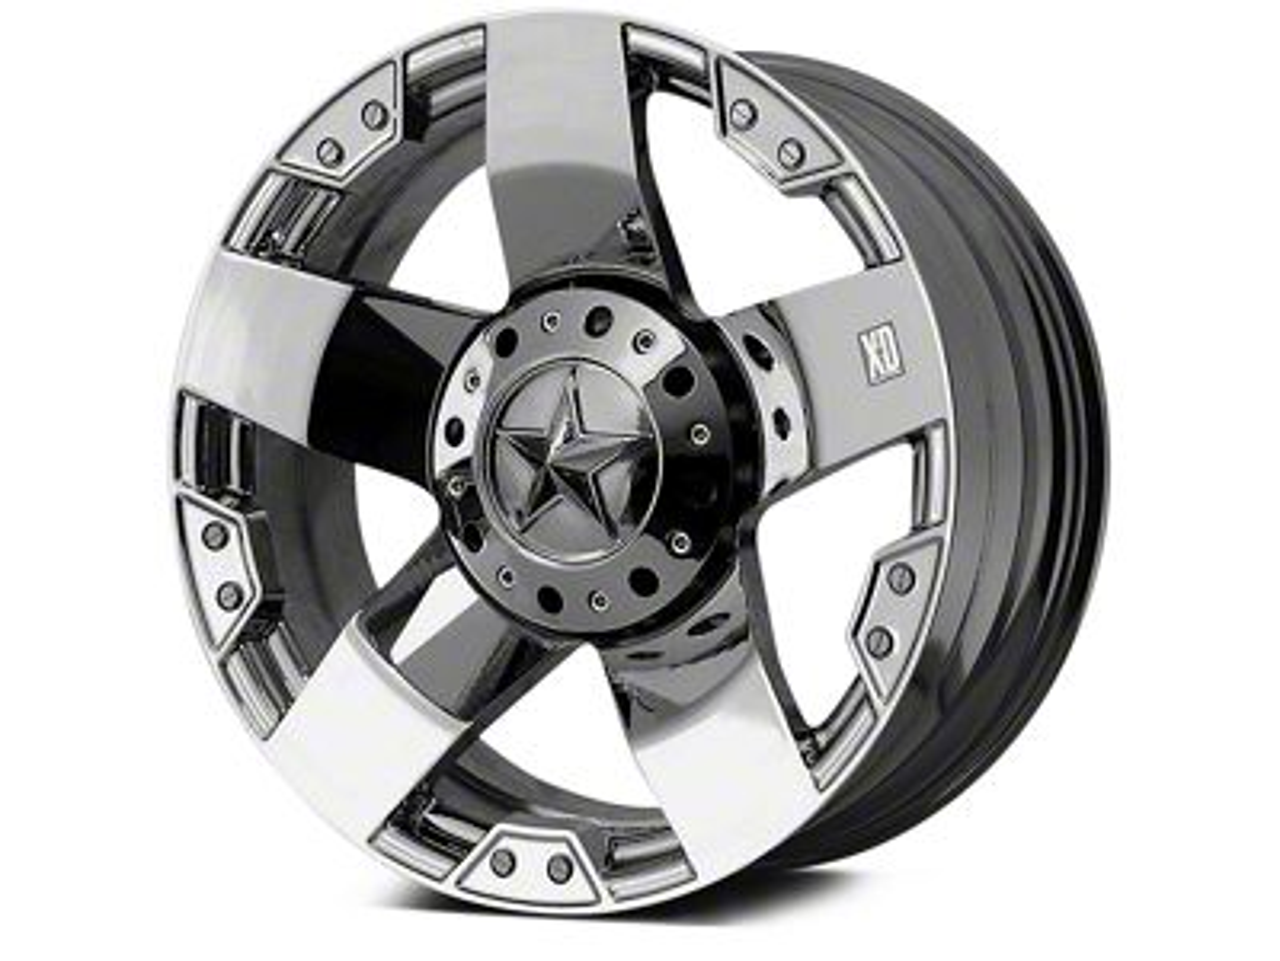 Rockstar XD775 Chrome 5-Lug Wheel - 20x10 (02-18 RAM 1500, Excluding Mega Cab)